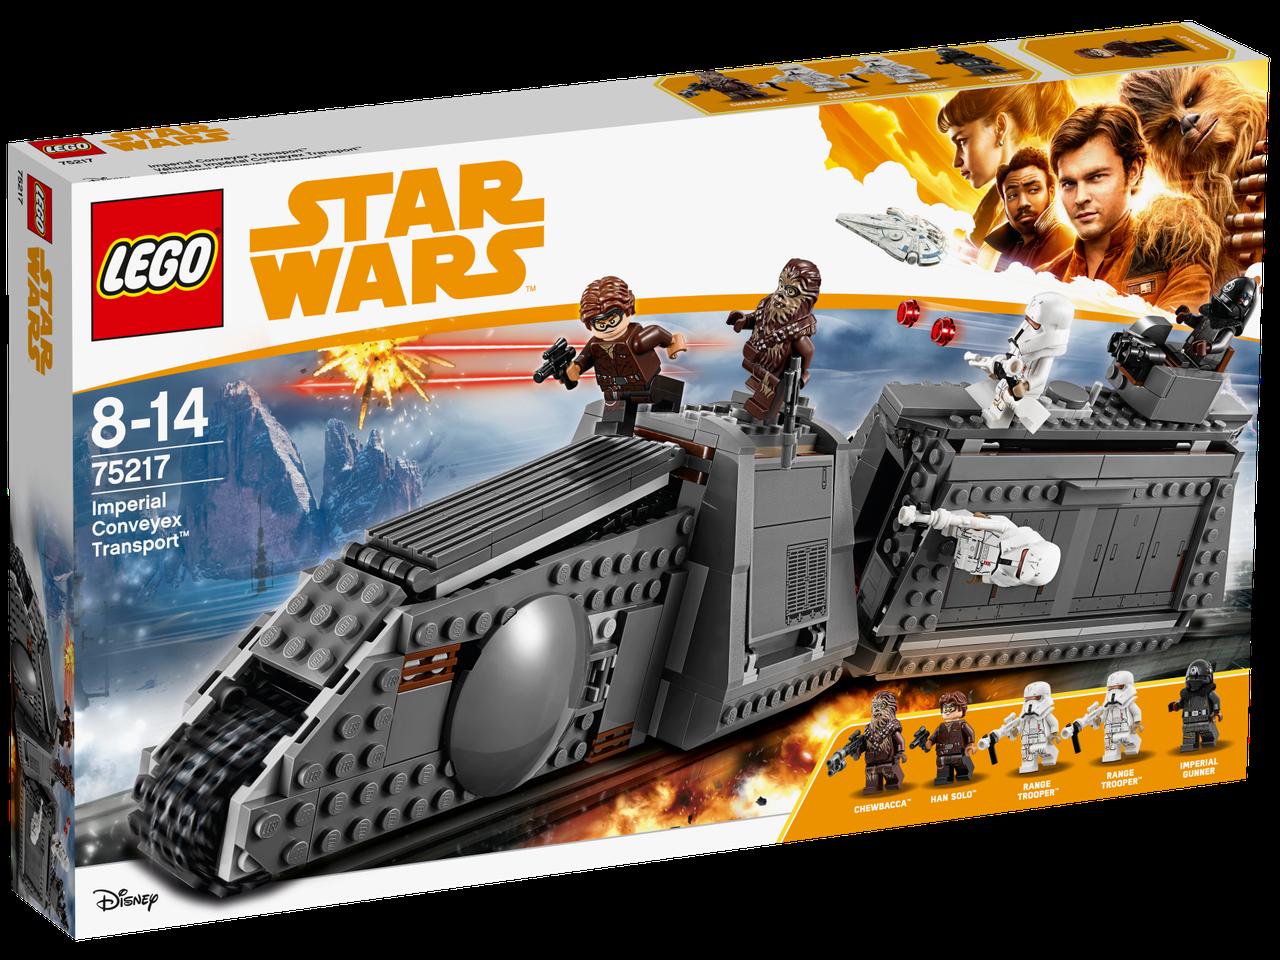 Lego Star Wars Имперский транспорт 75217